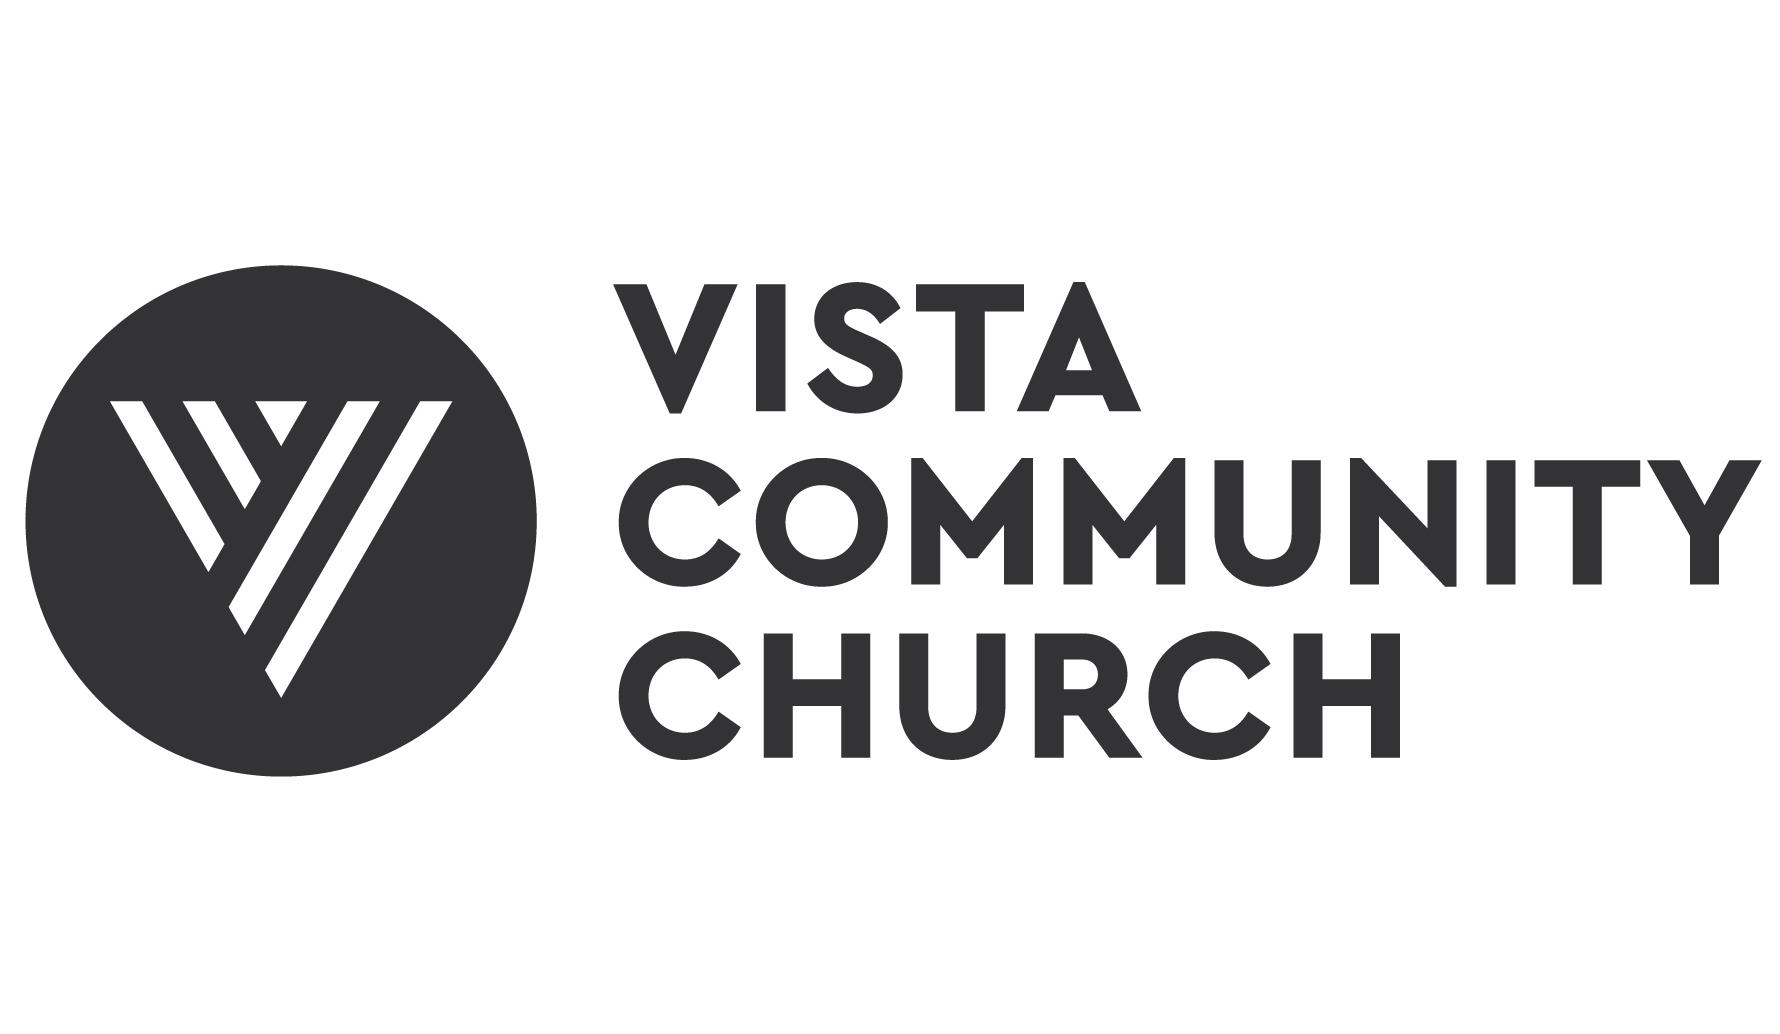 Vista Community Church